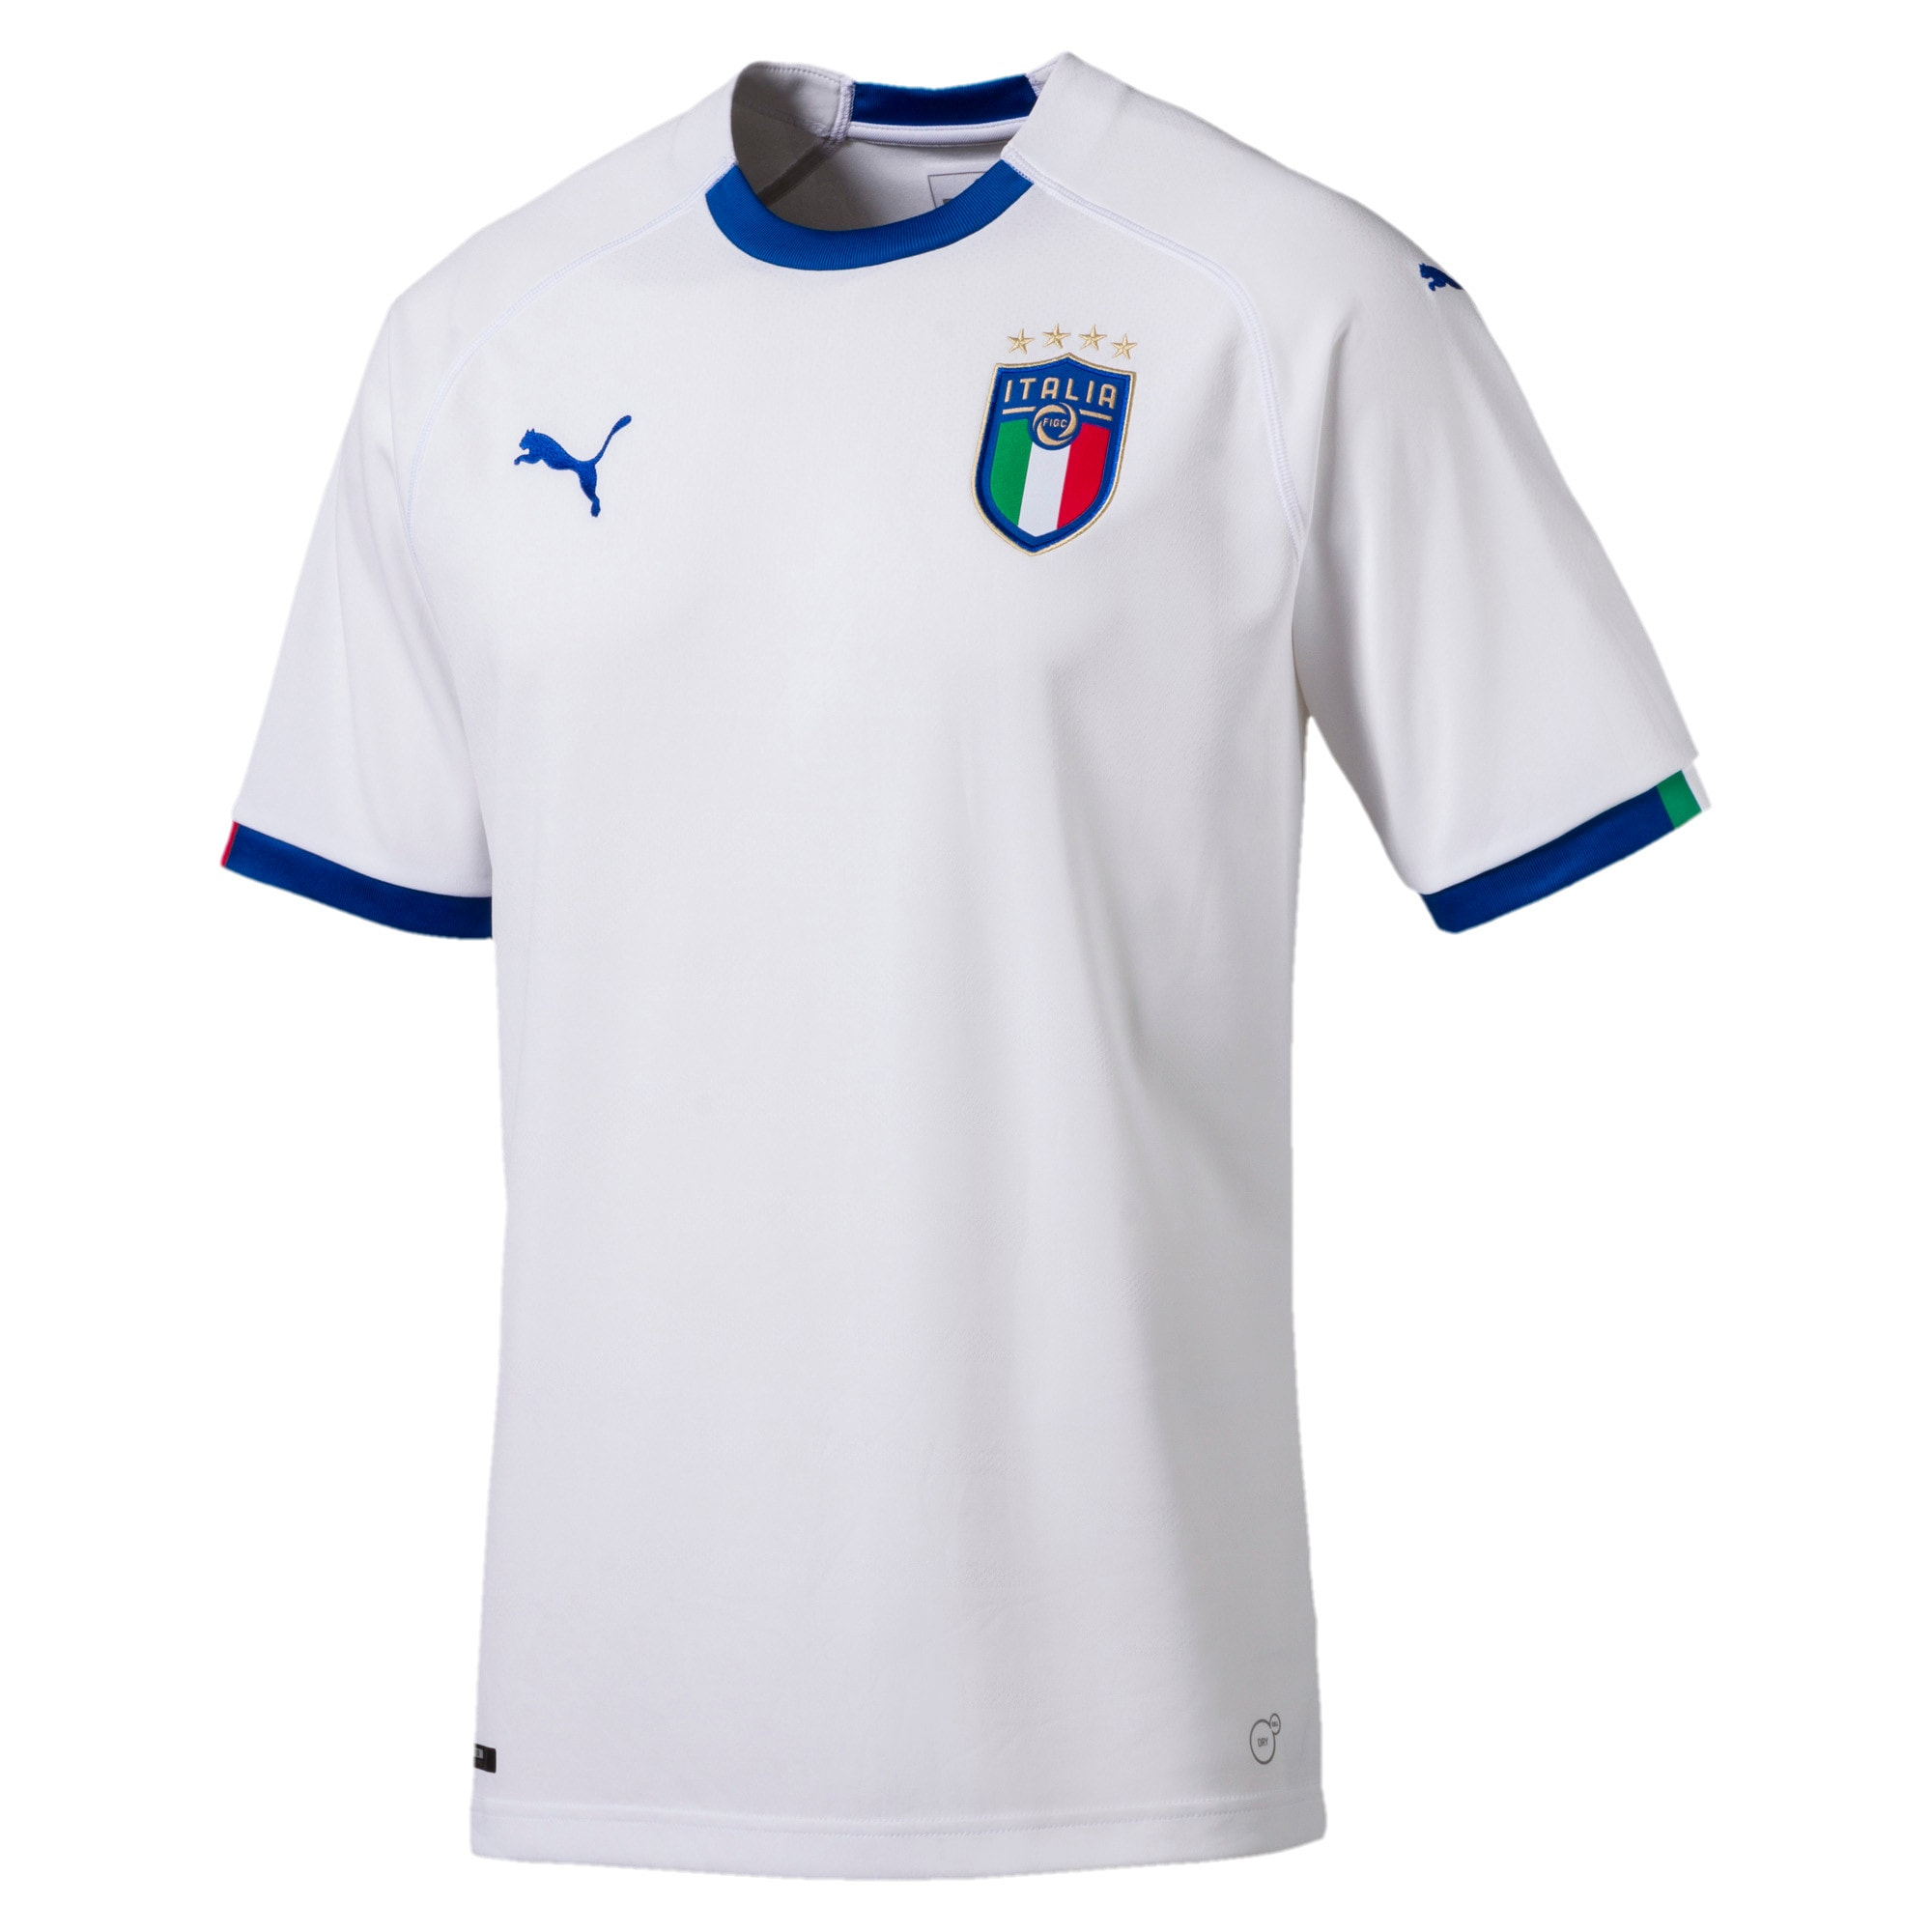 Thumbnail 4 of FIGC ITALIA アウェイ レプリカ SSシャツ 半袖, Puma White-Team Power Blue, medium-JPN